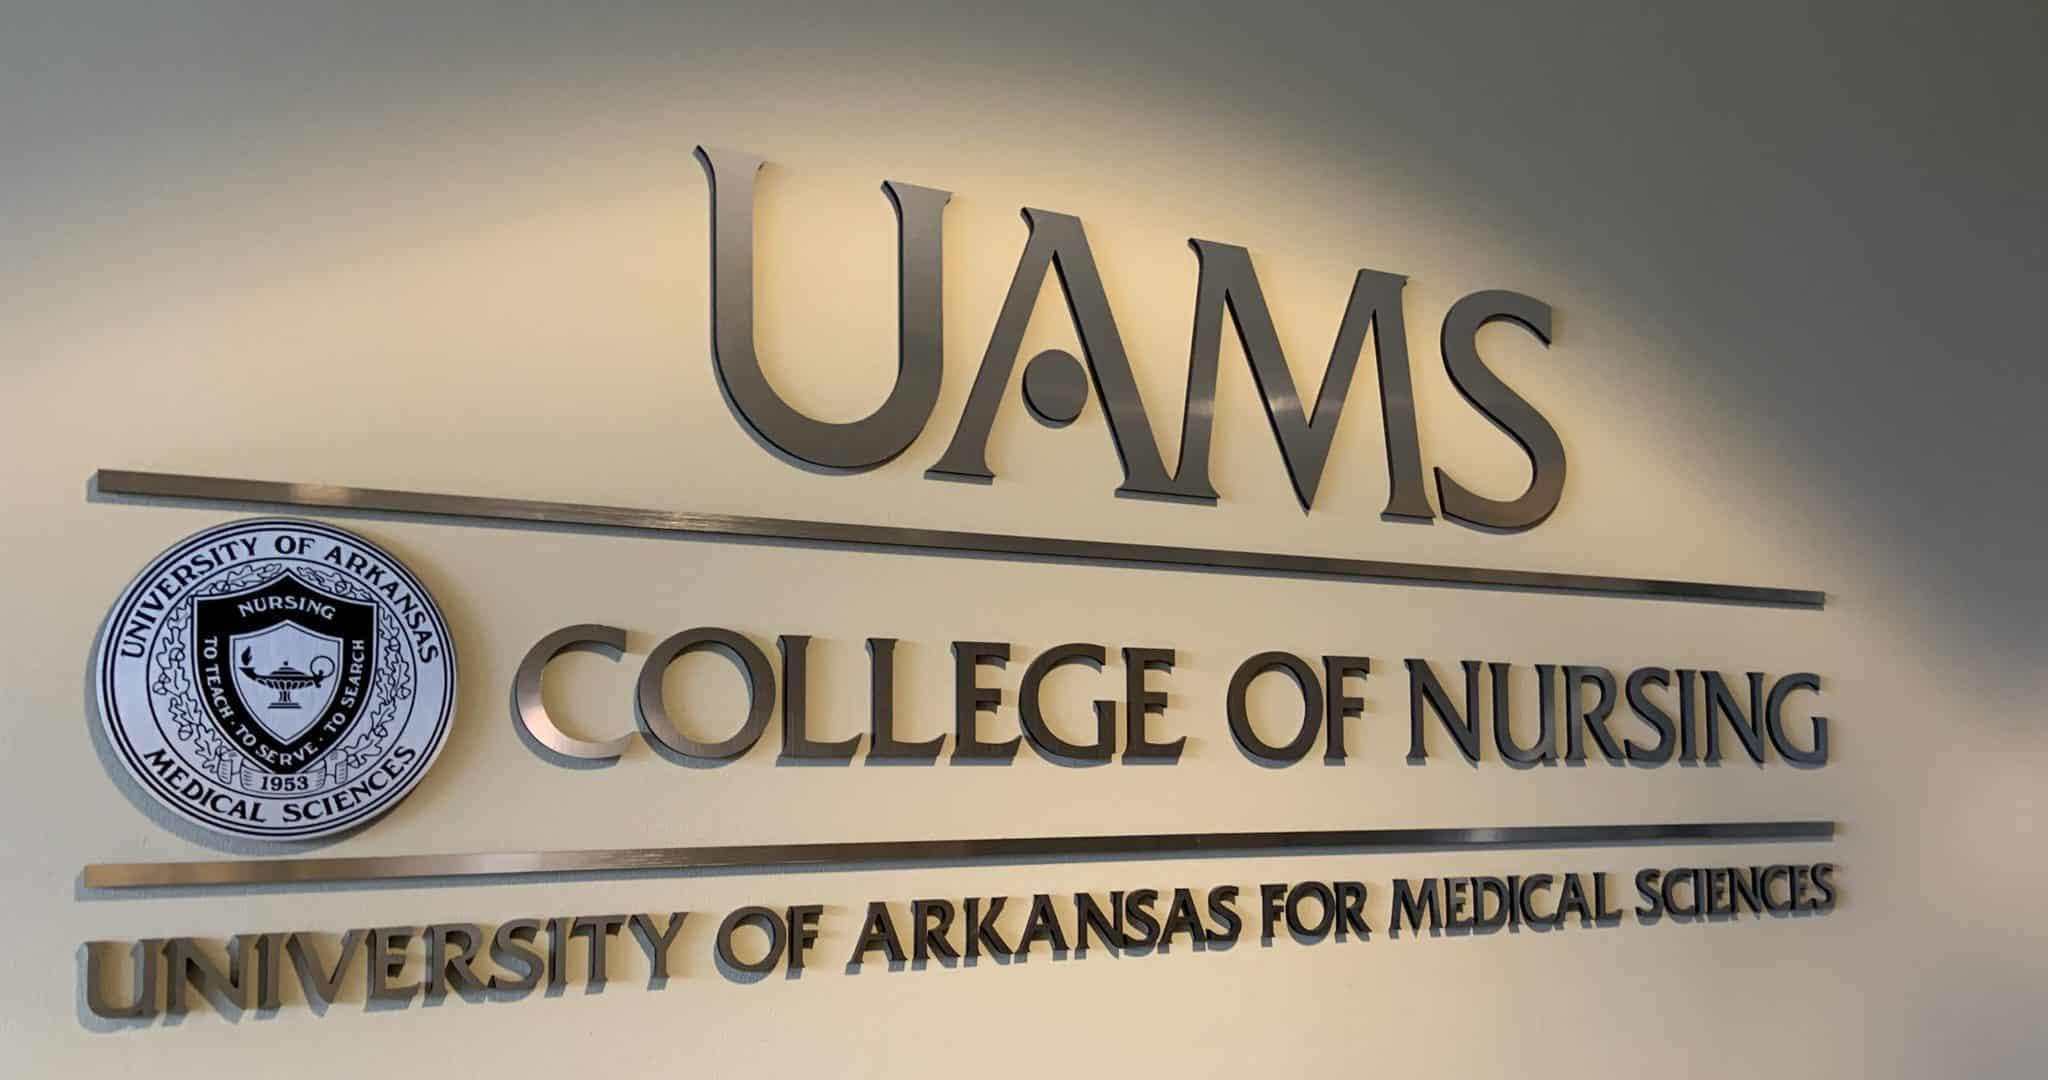 UAMS College of Nursing sign